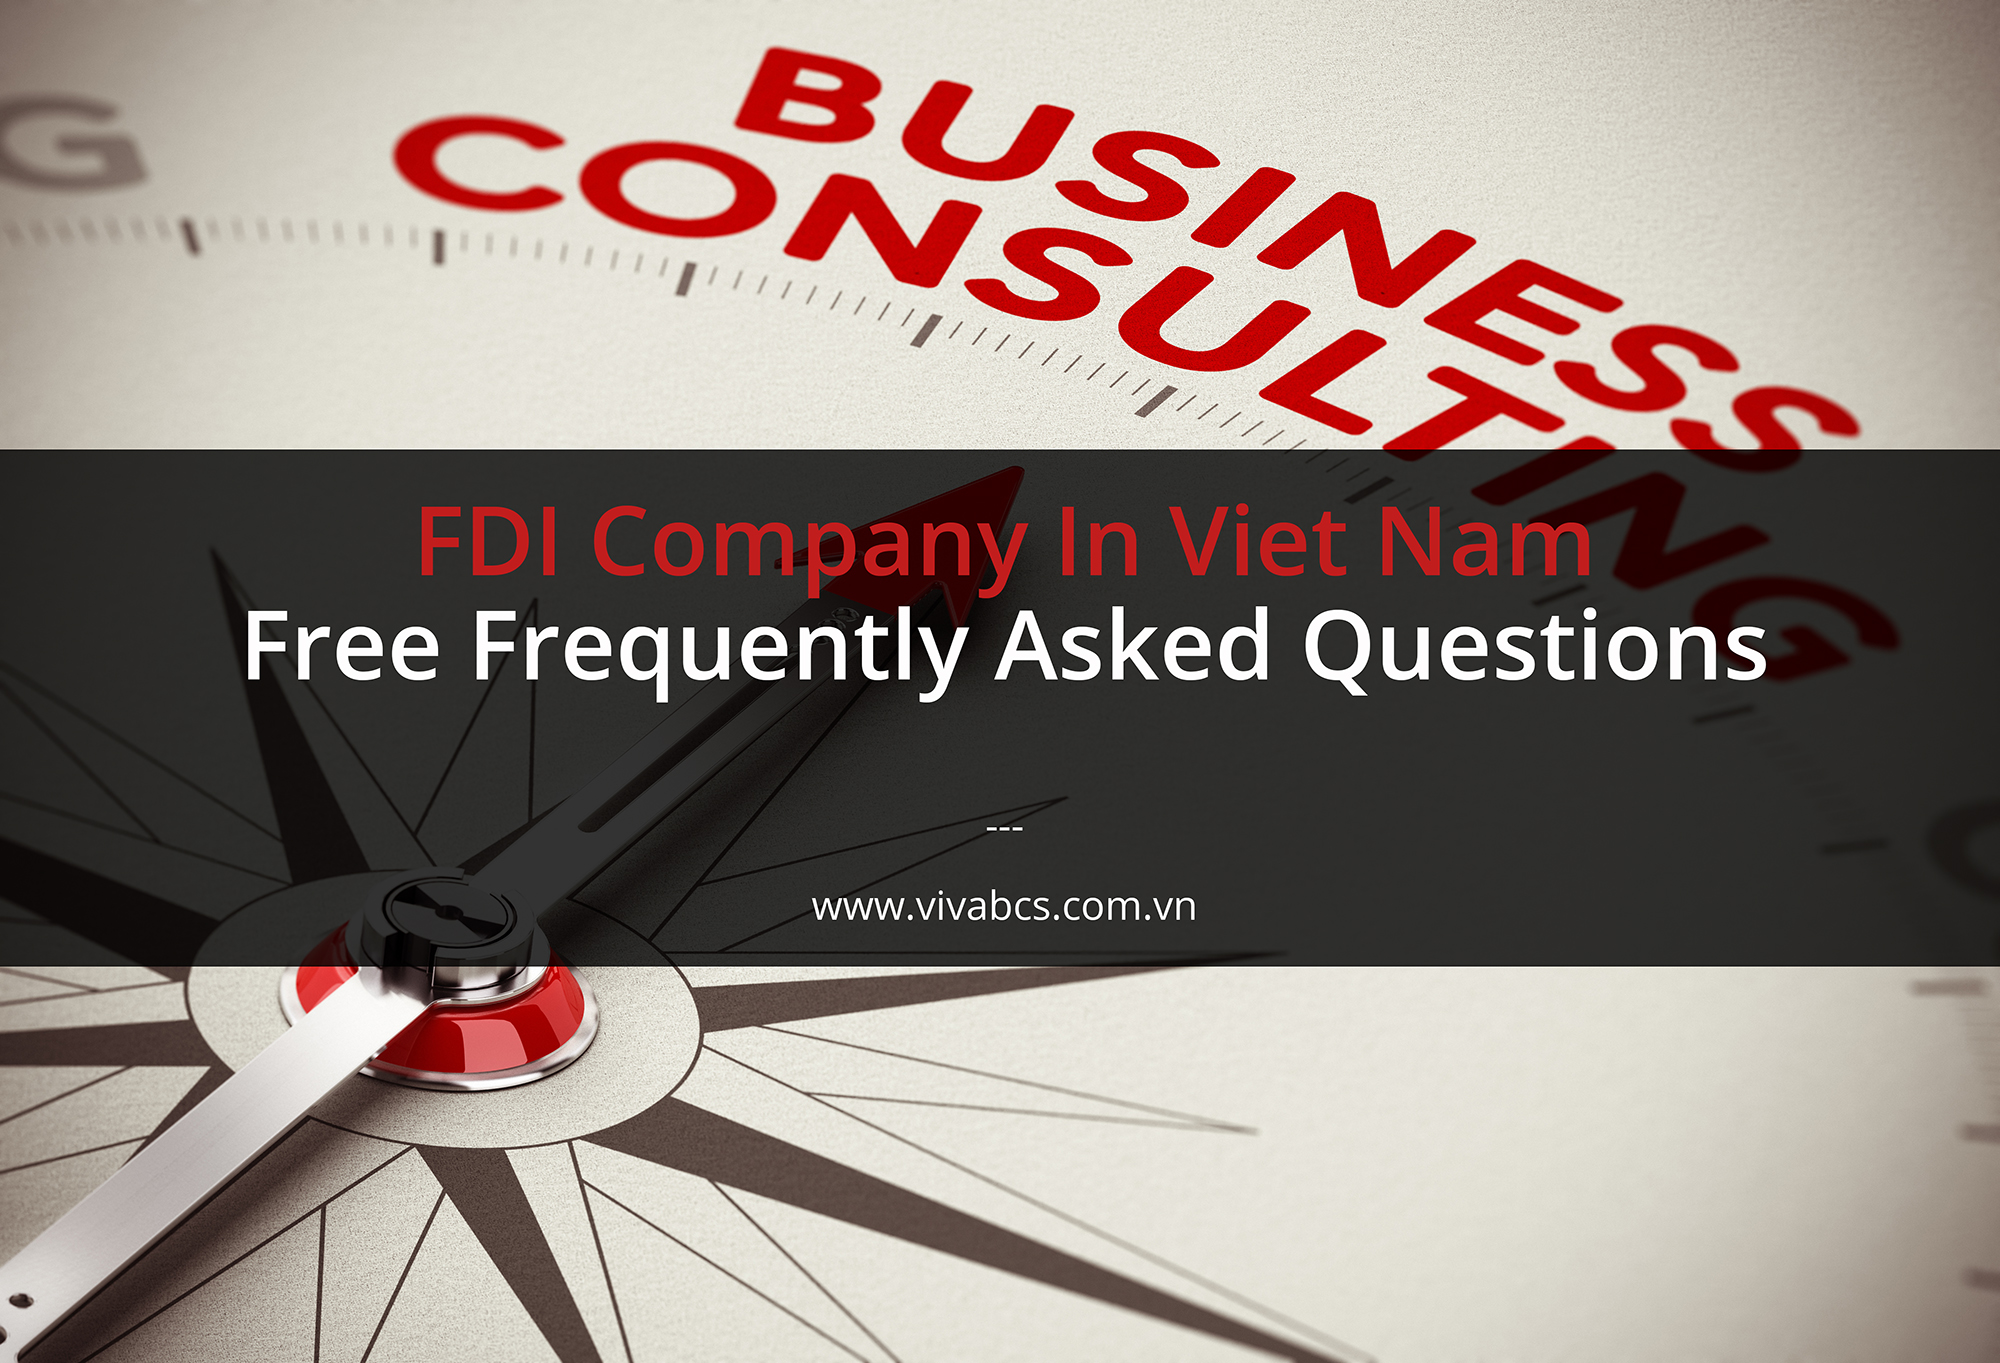 FDI Companies in Vietnam